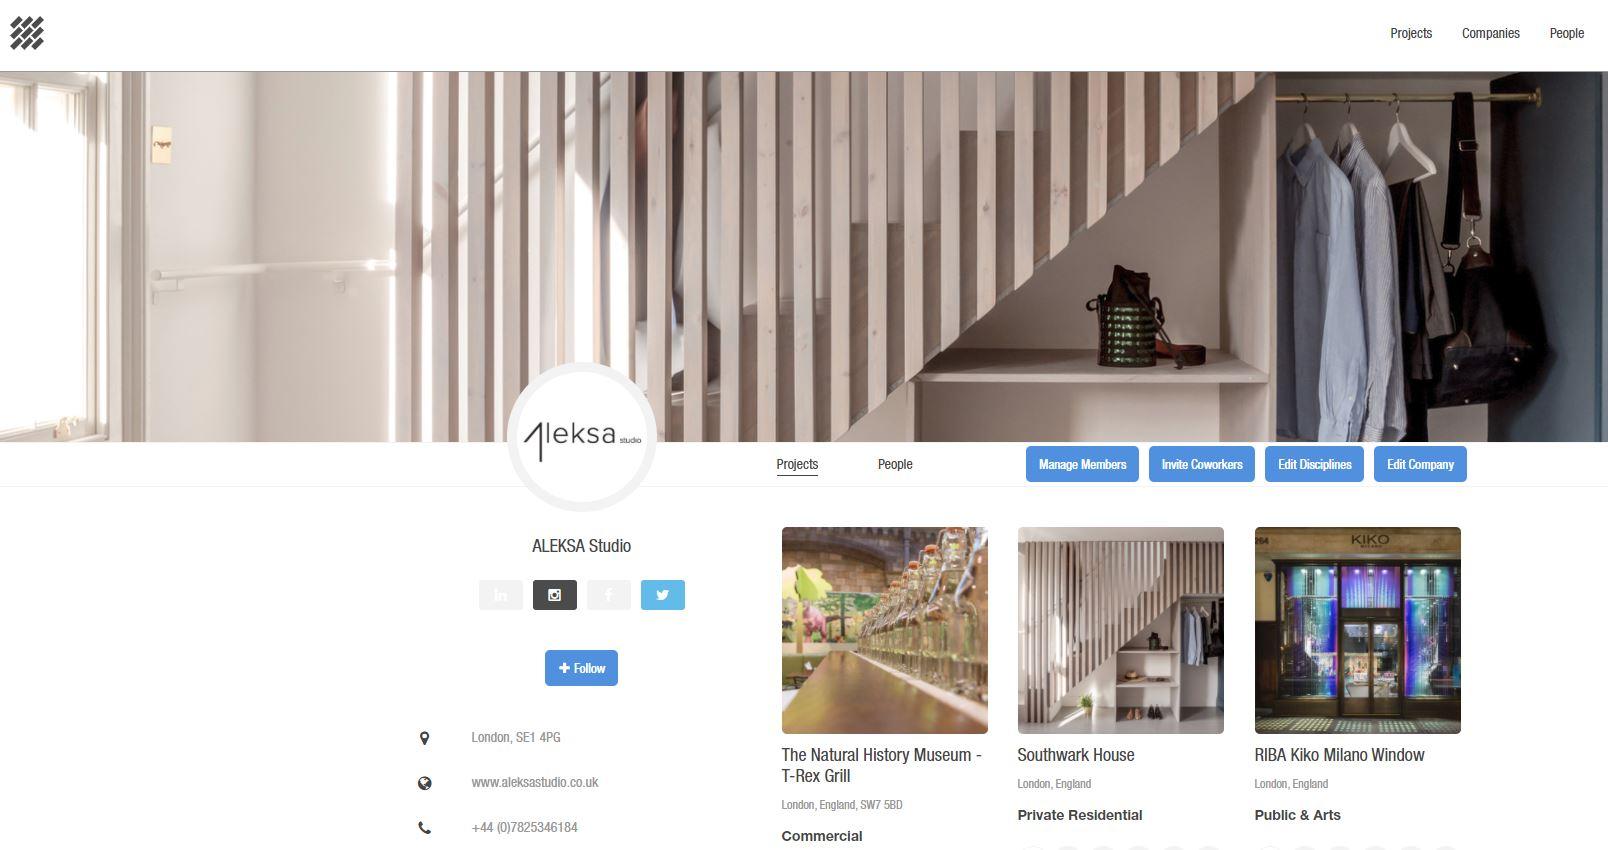 Build-upp_ALEKSA studio.JPG